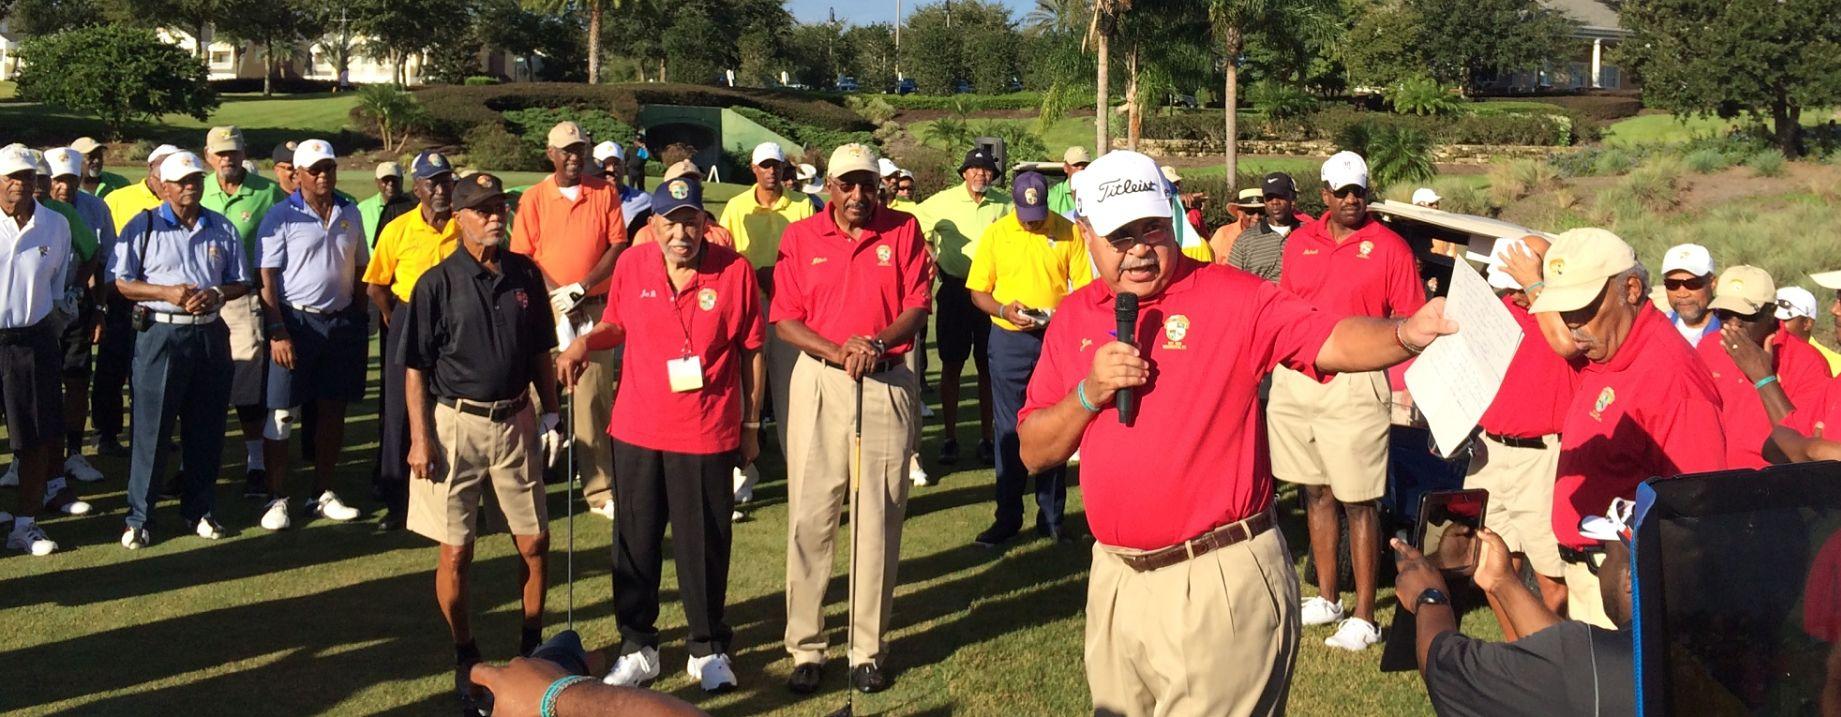 DC Pro Duffers National Orlando Reunion Golf Resort 25th Anniversary